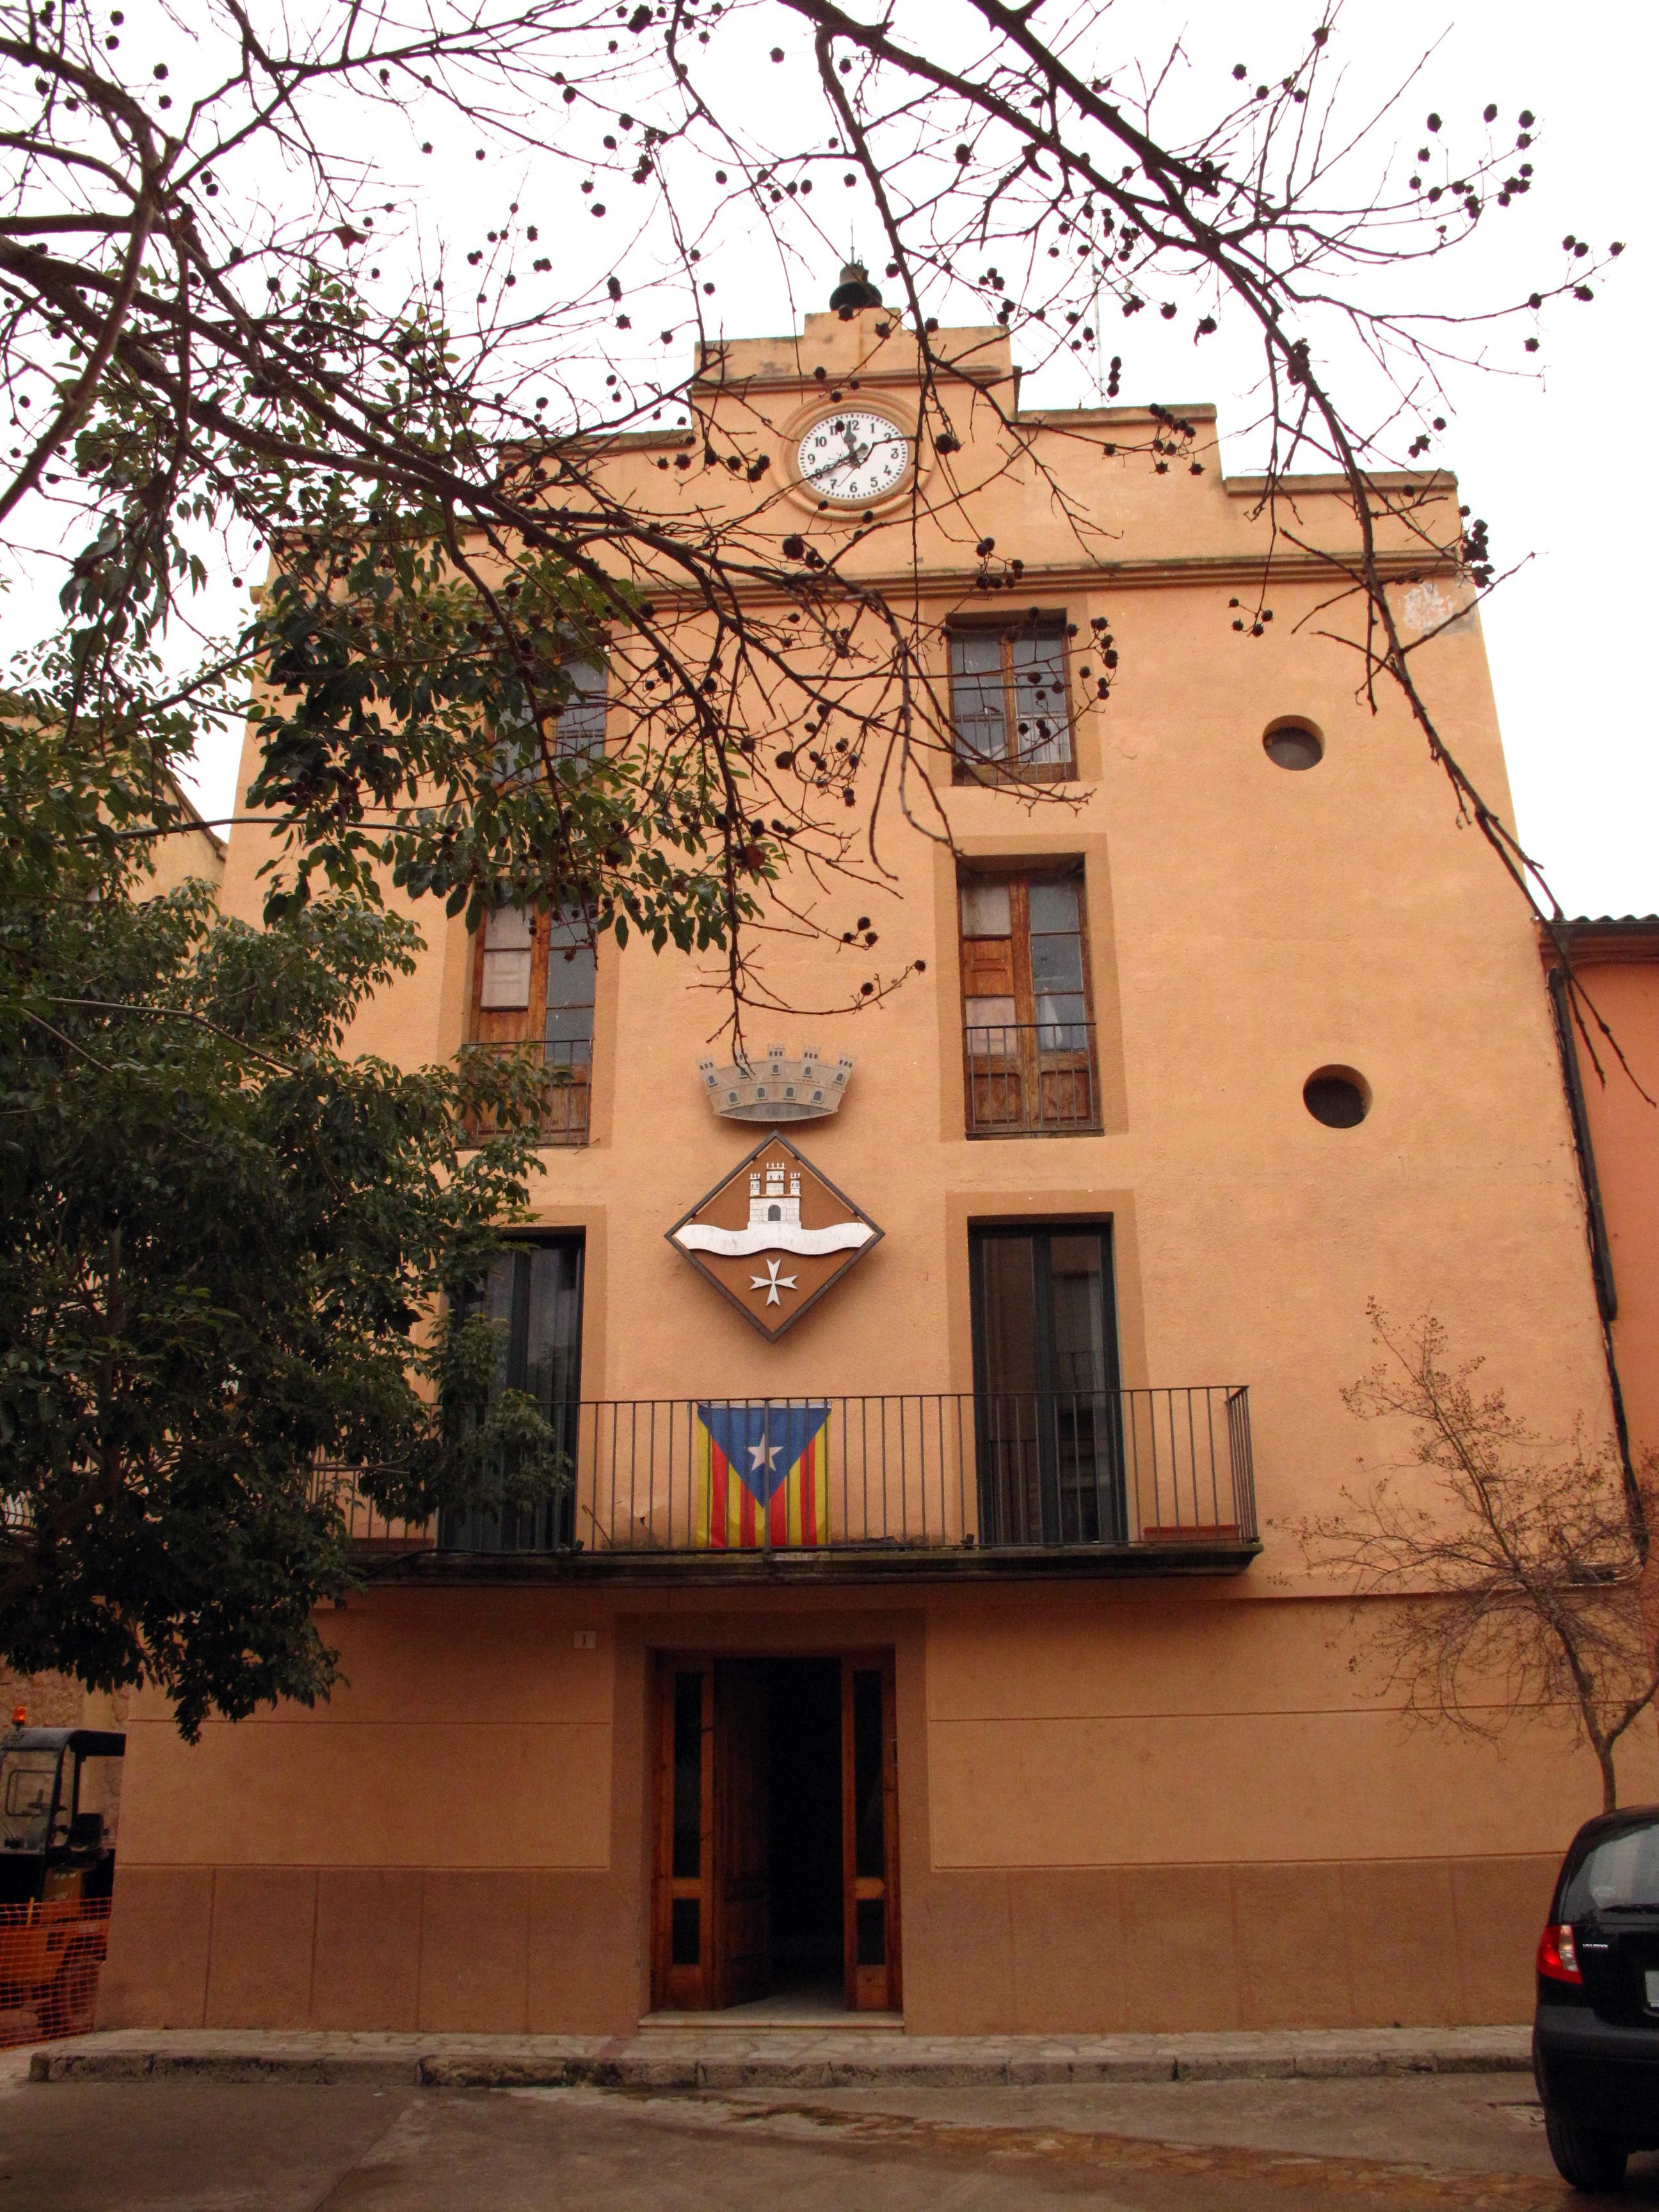 Miravet town hall